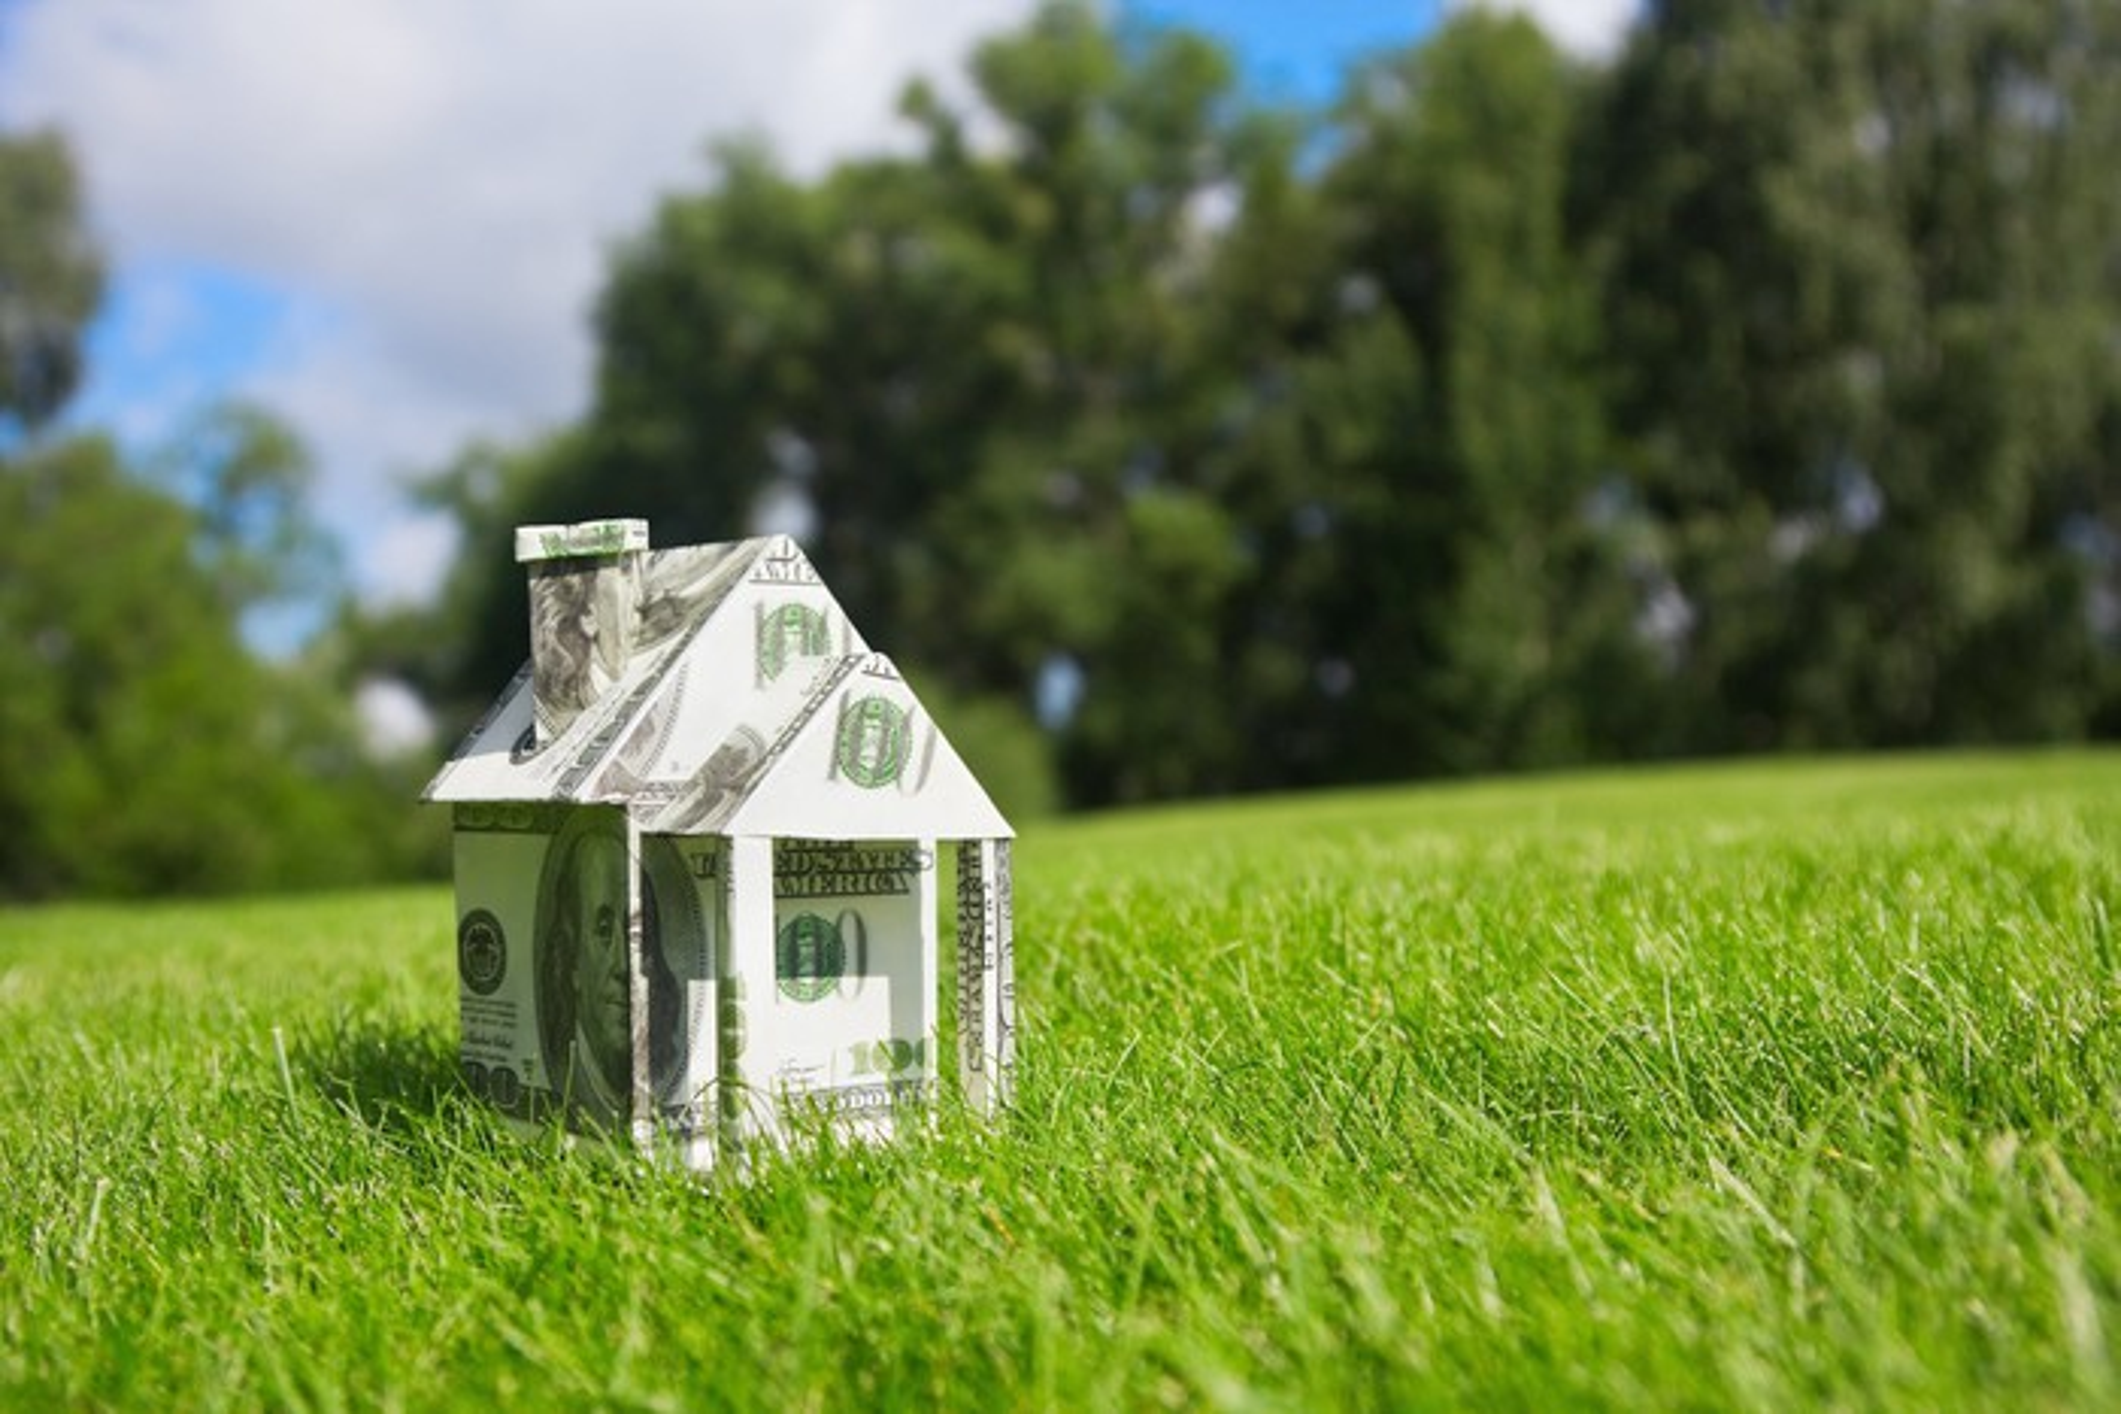 A house made of folded U.S. dollar bills sits on a grassy lawn.